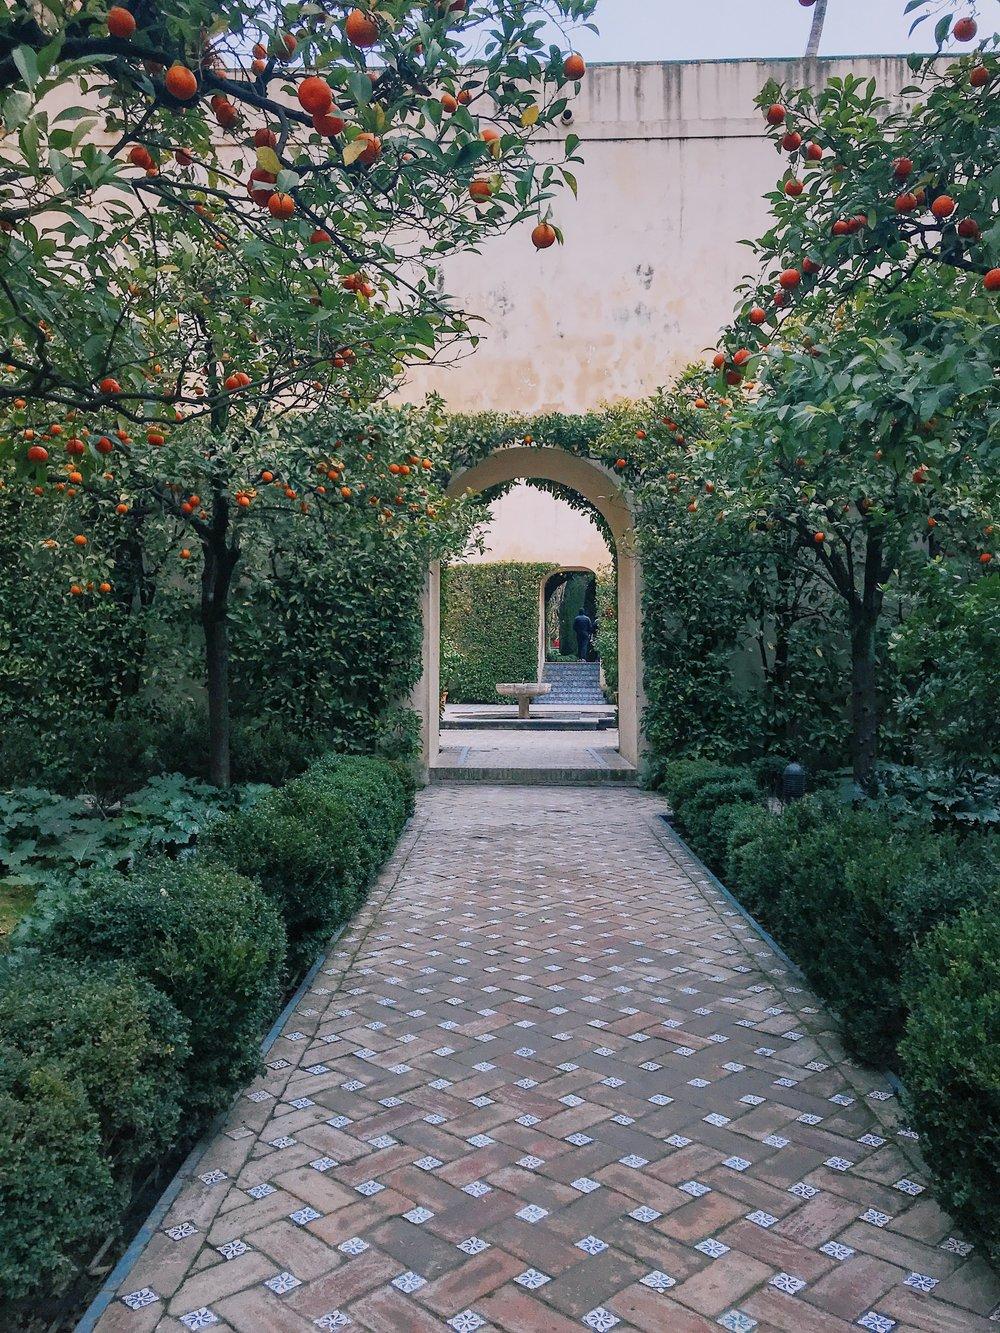 More gardens and orange trees.